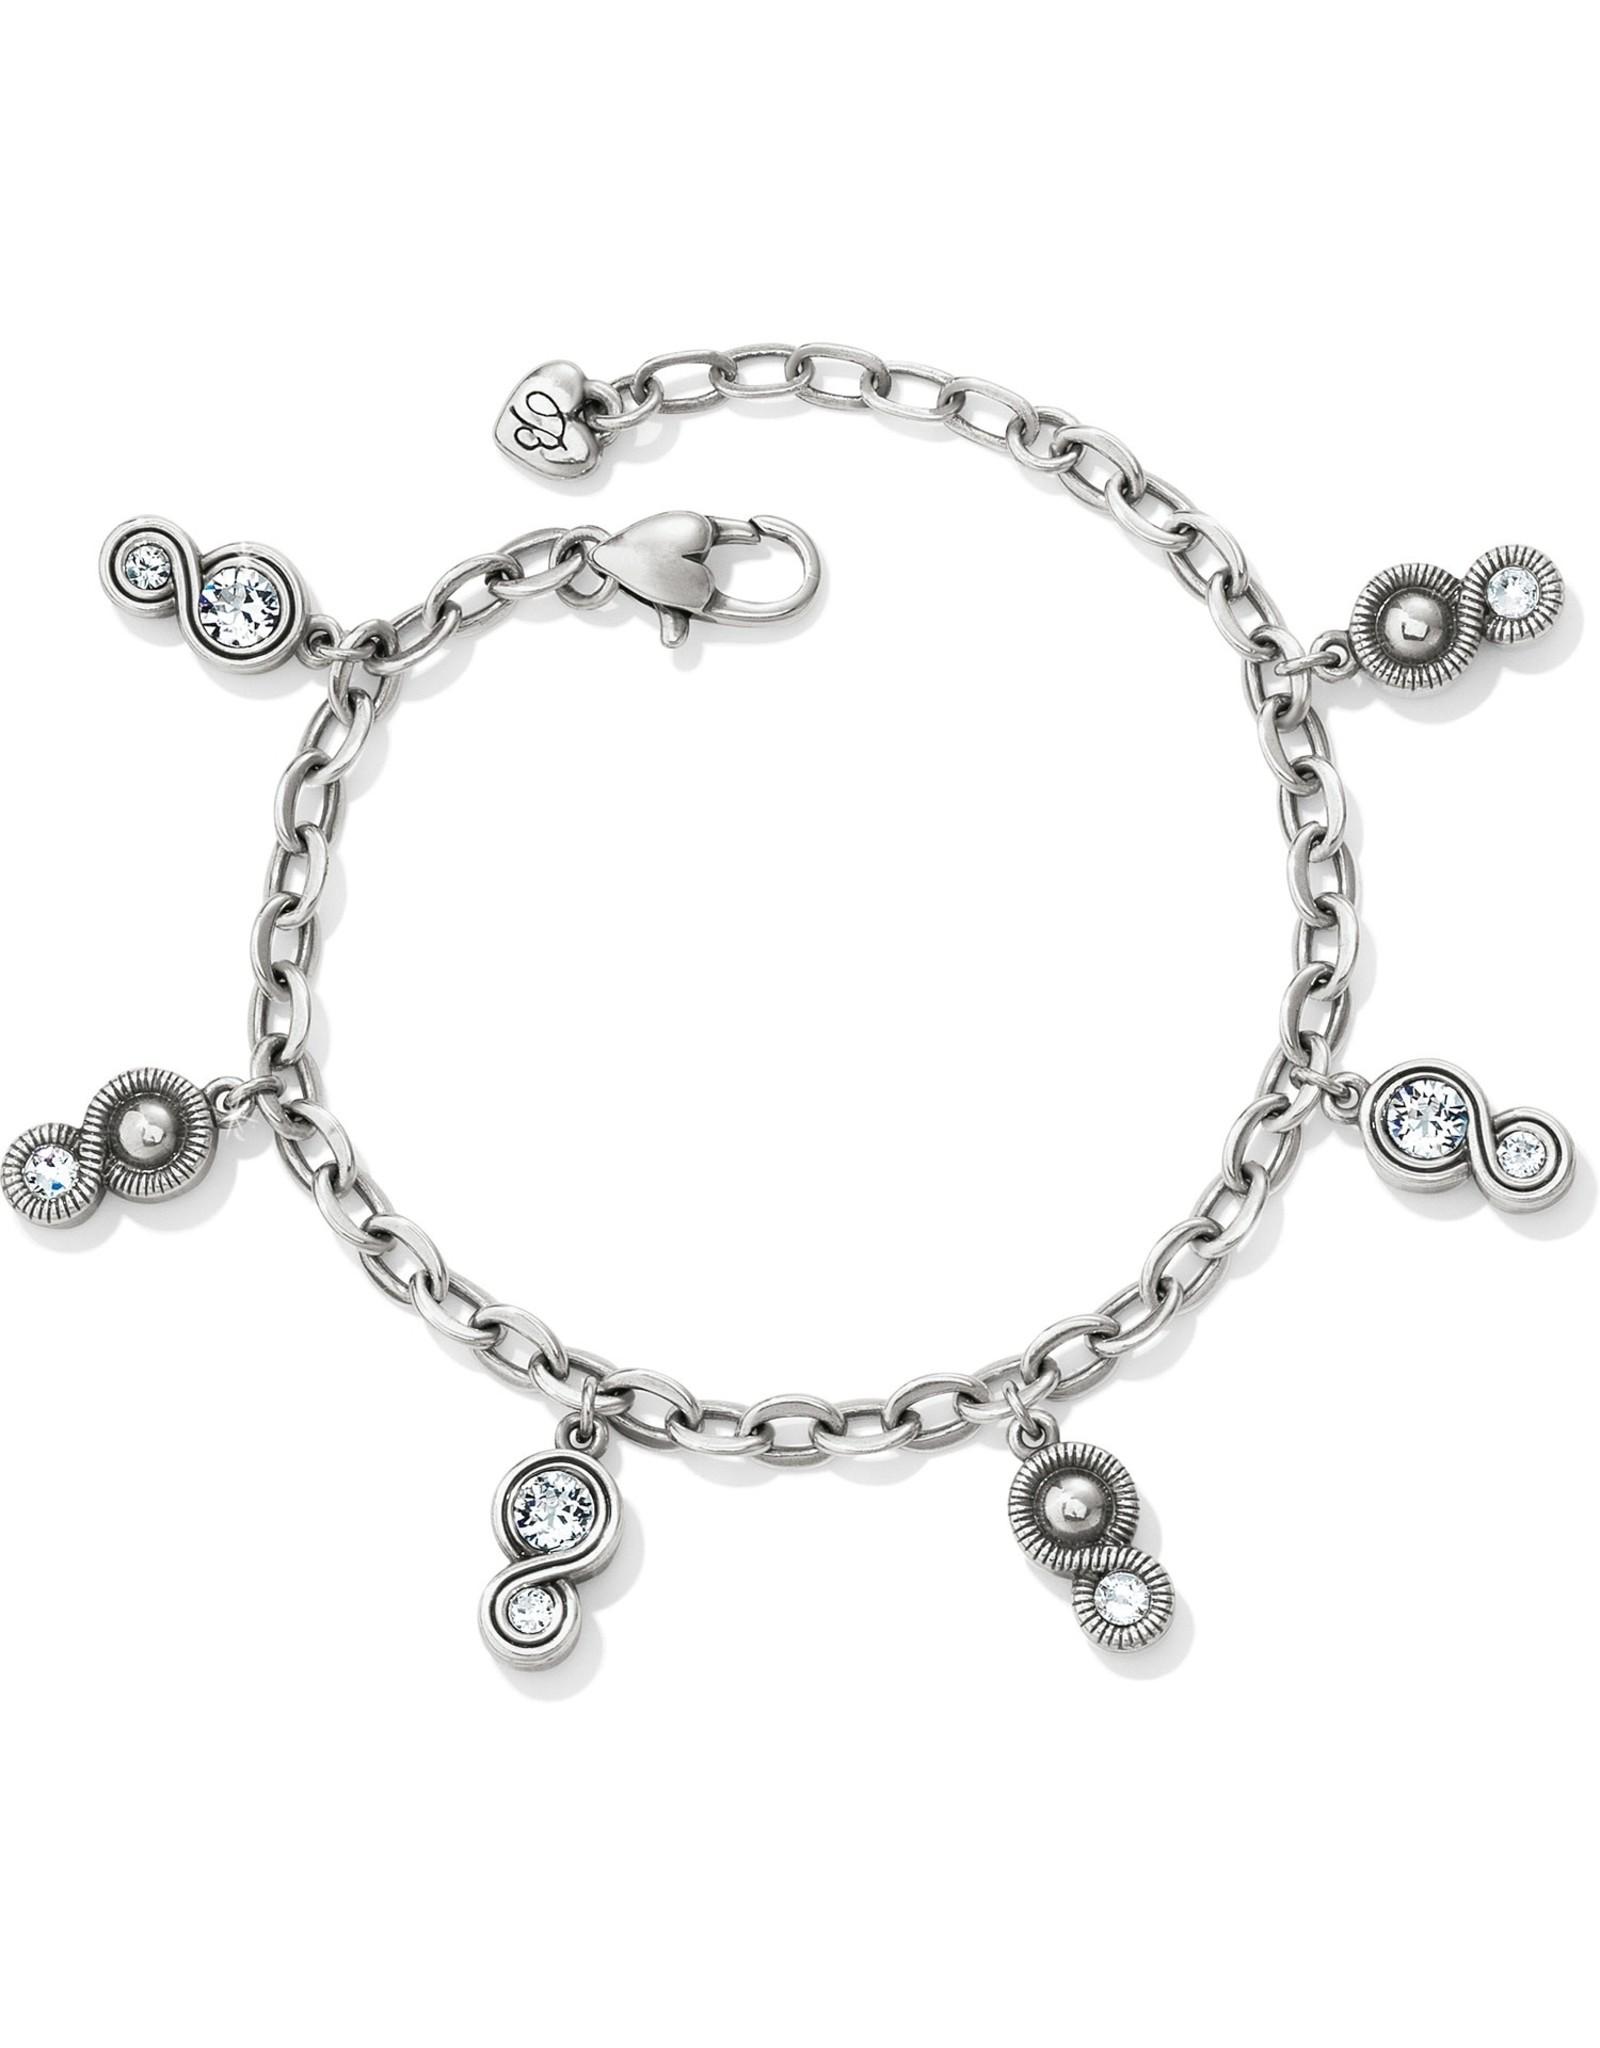 Brighton Infinity Sparkle Charm Bracelet